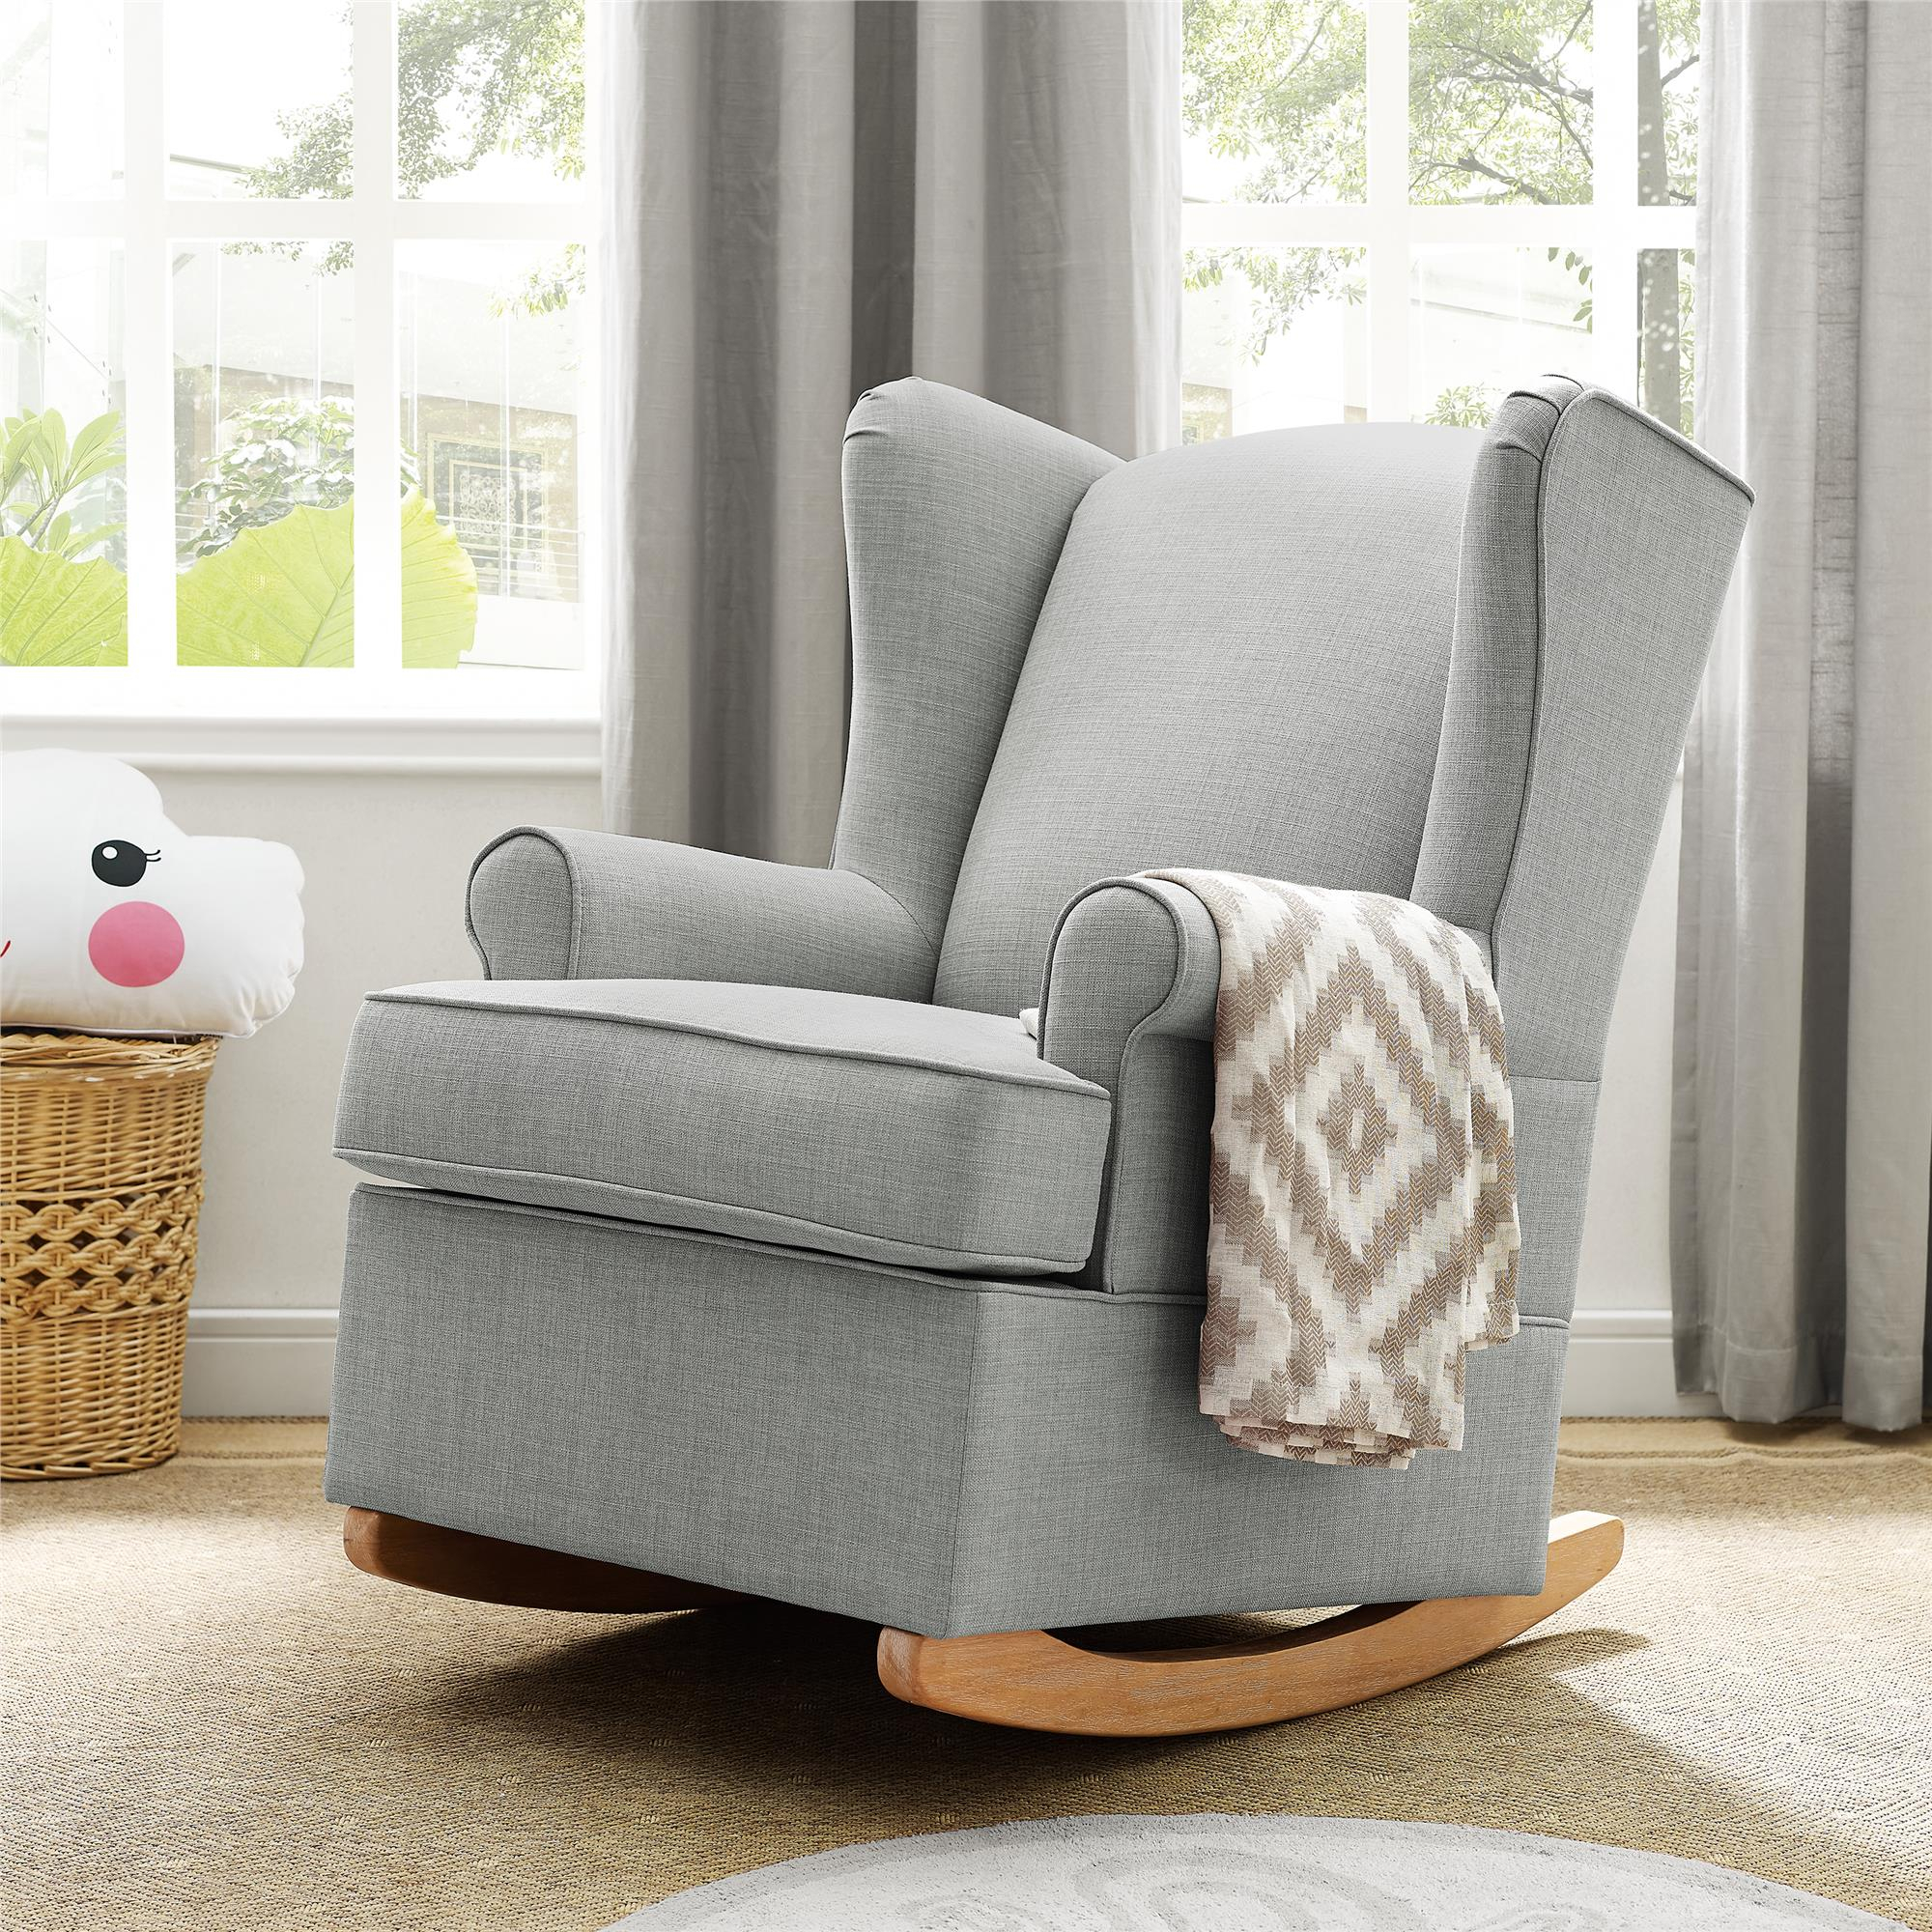 Dorel Living | Baby Relax Brennan Wingback Convertible Rocker, Gray In Brennan Sofa Chairs (Image 11 of 25)